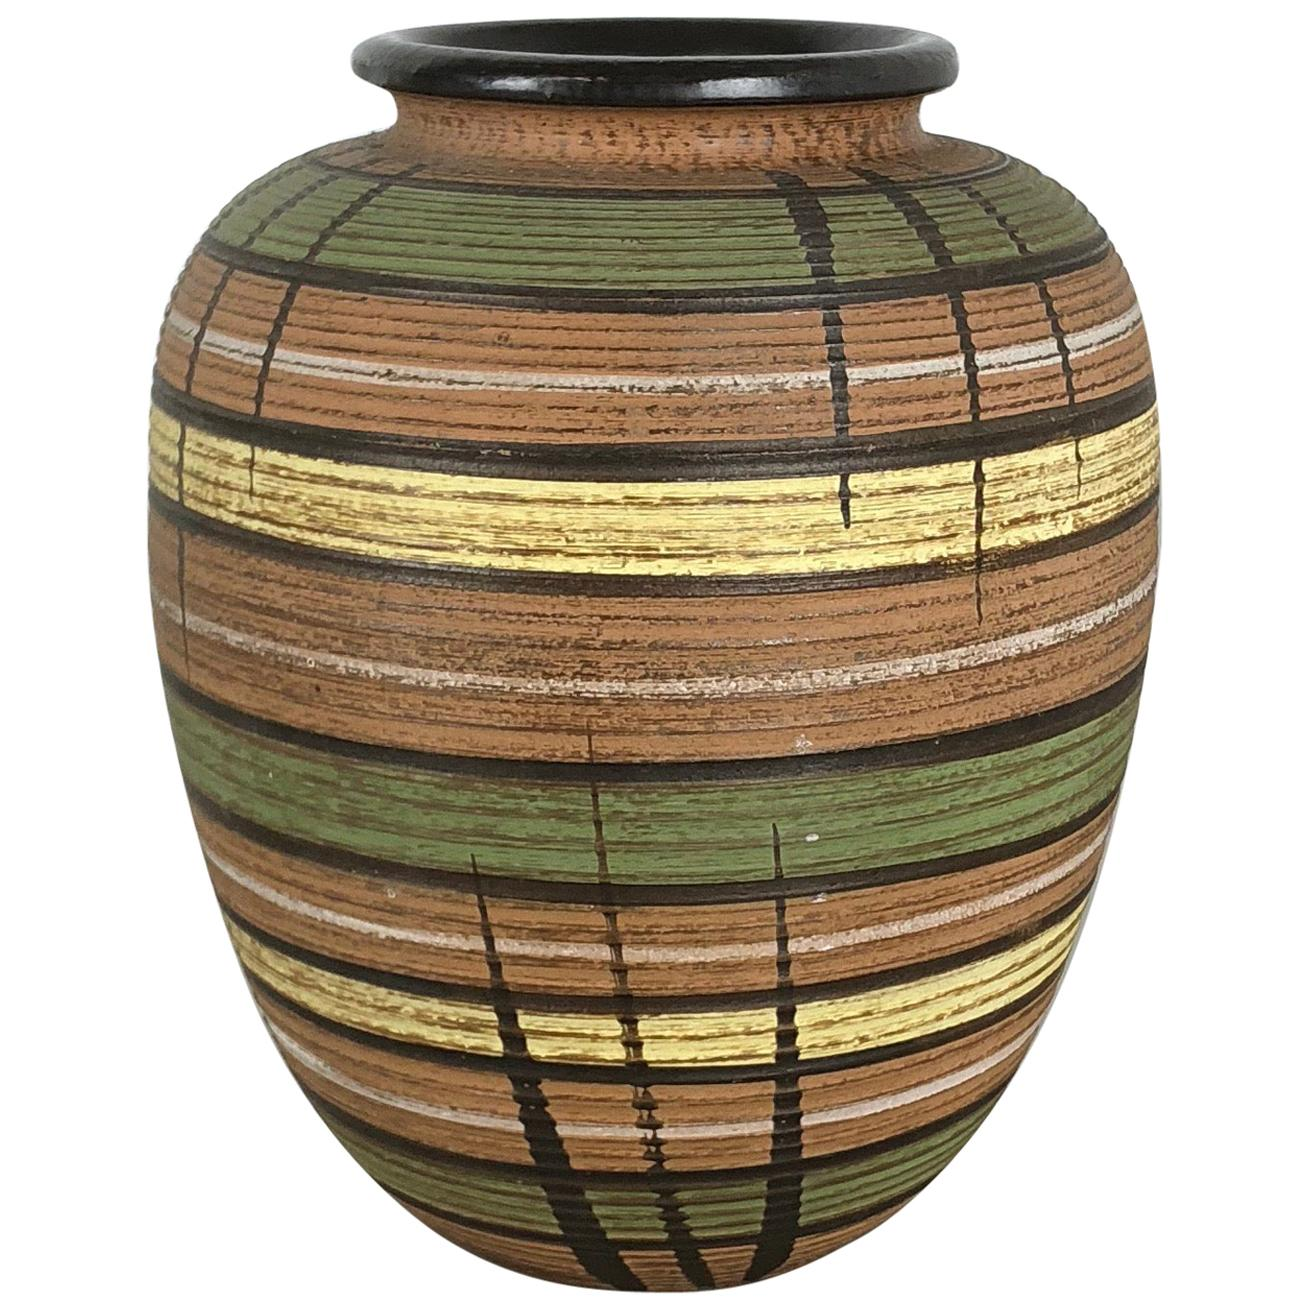 Small Abstract Ceramic Pottery Vase by Dümmler and Breiden, Germany, 1950s